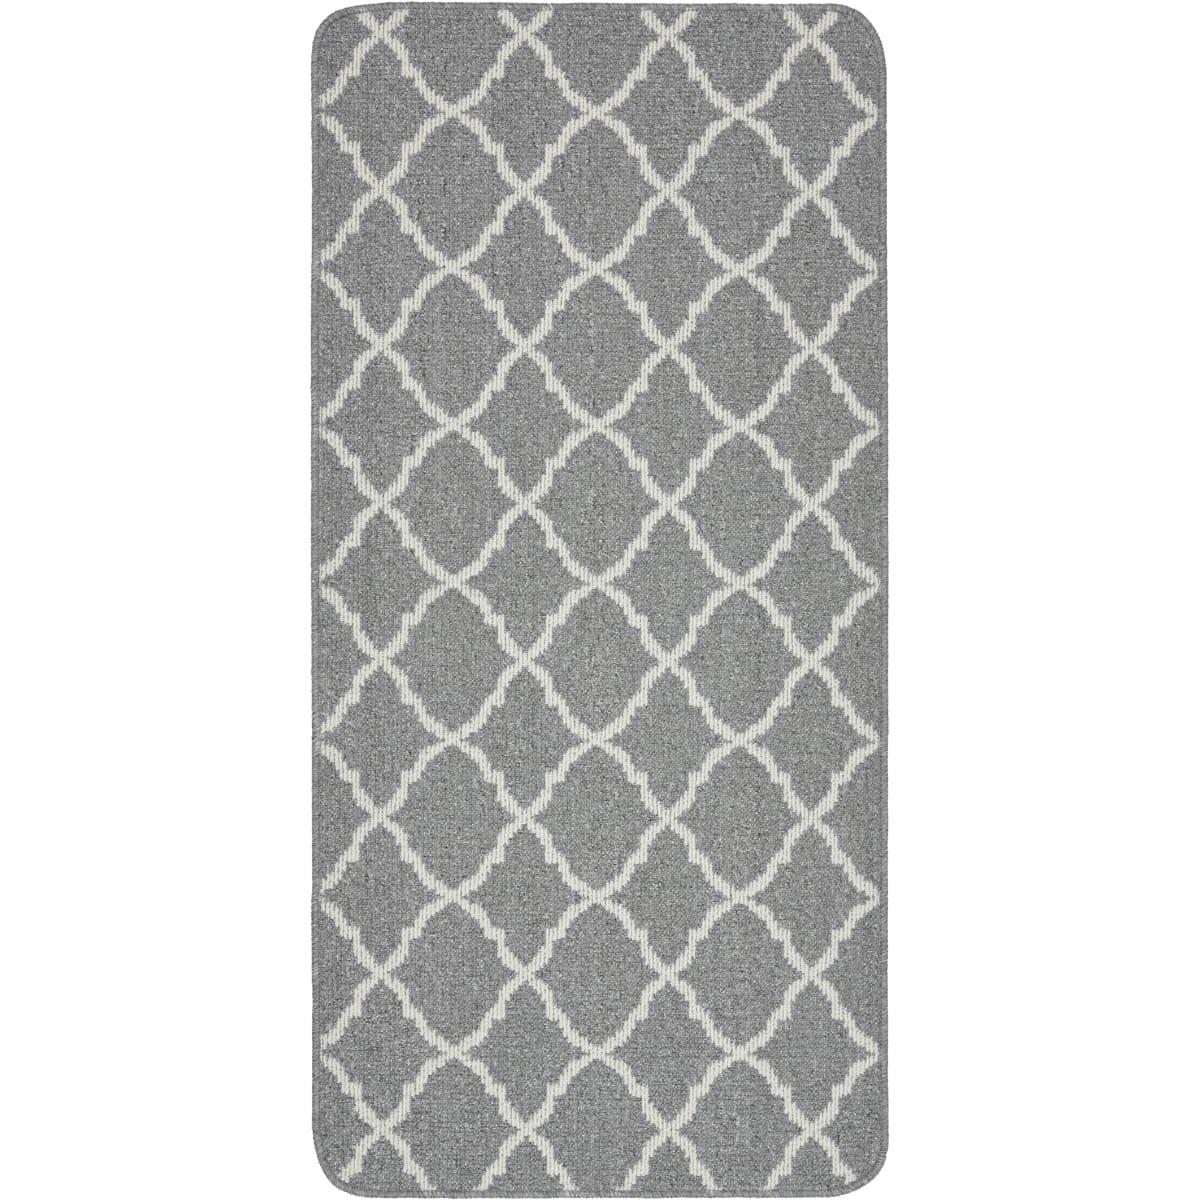 Коврик «Cardiff», 67x140 см, полипропилен/резина, цвет серый